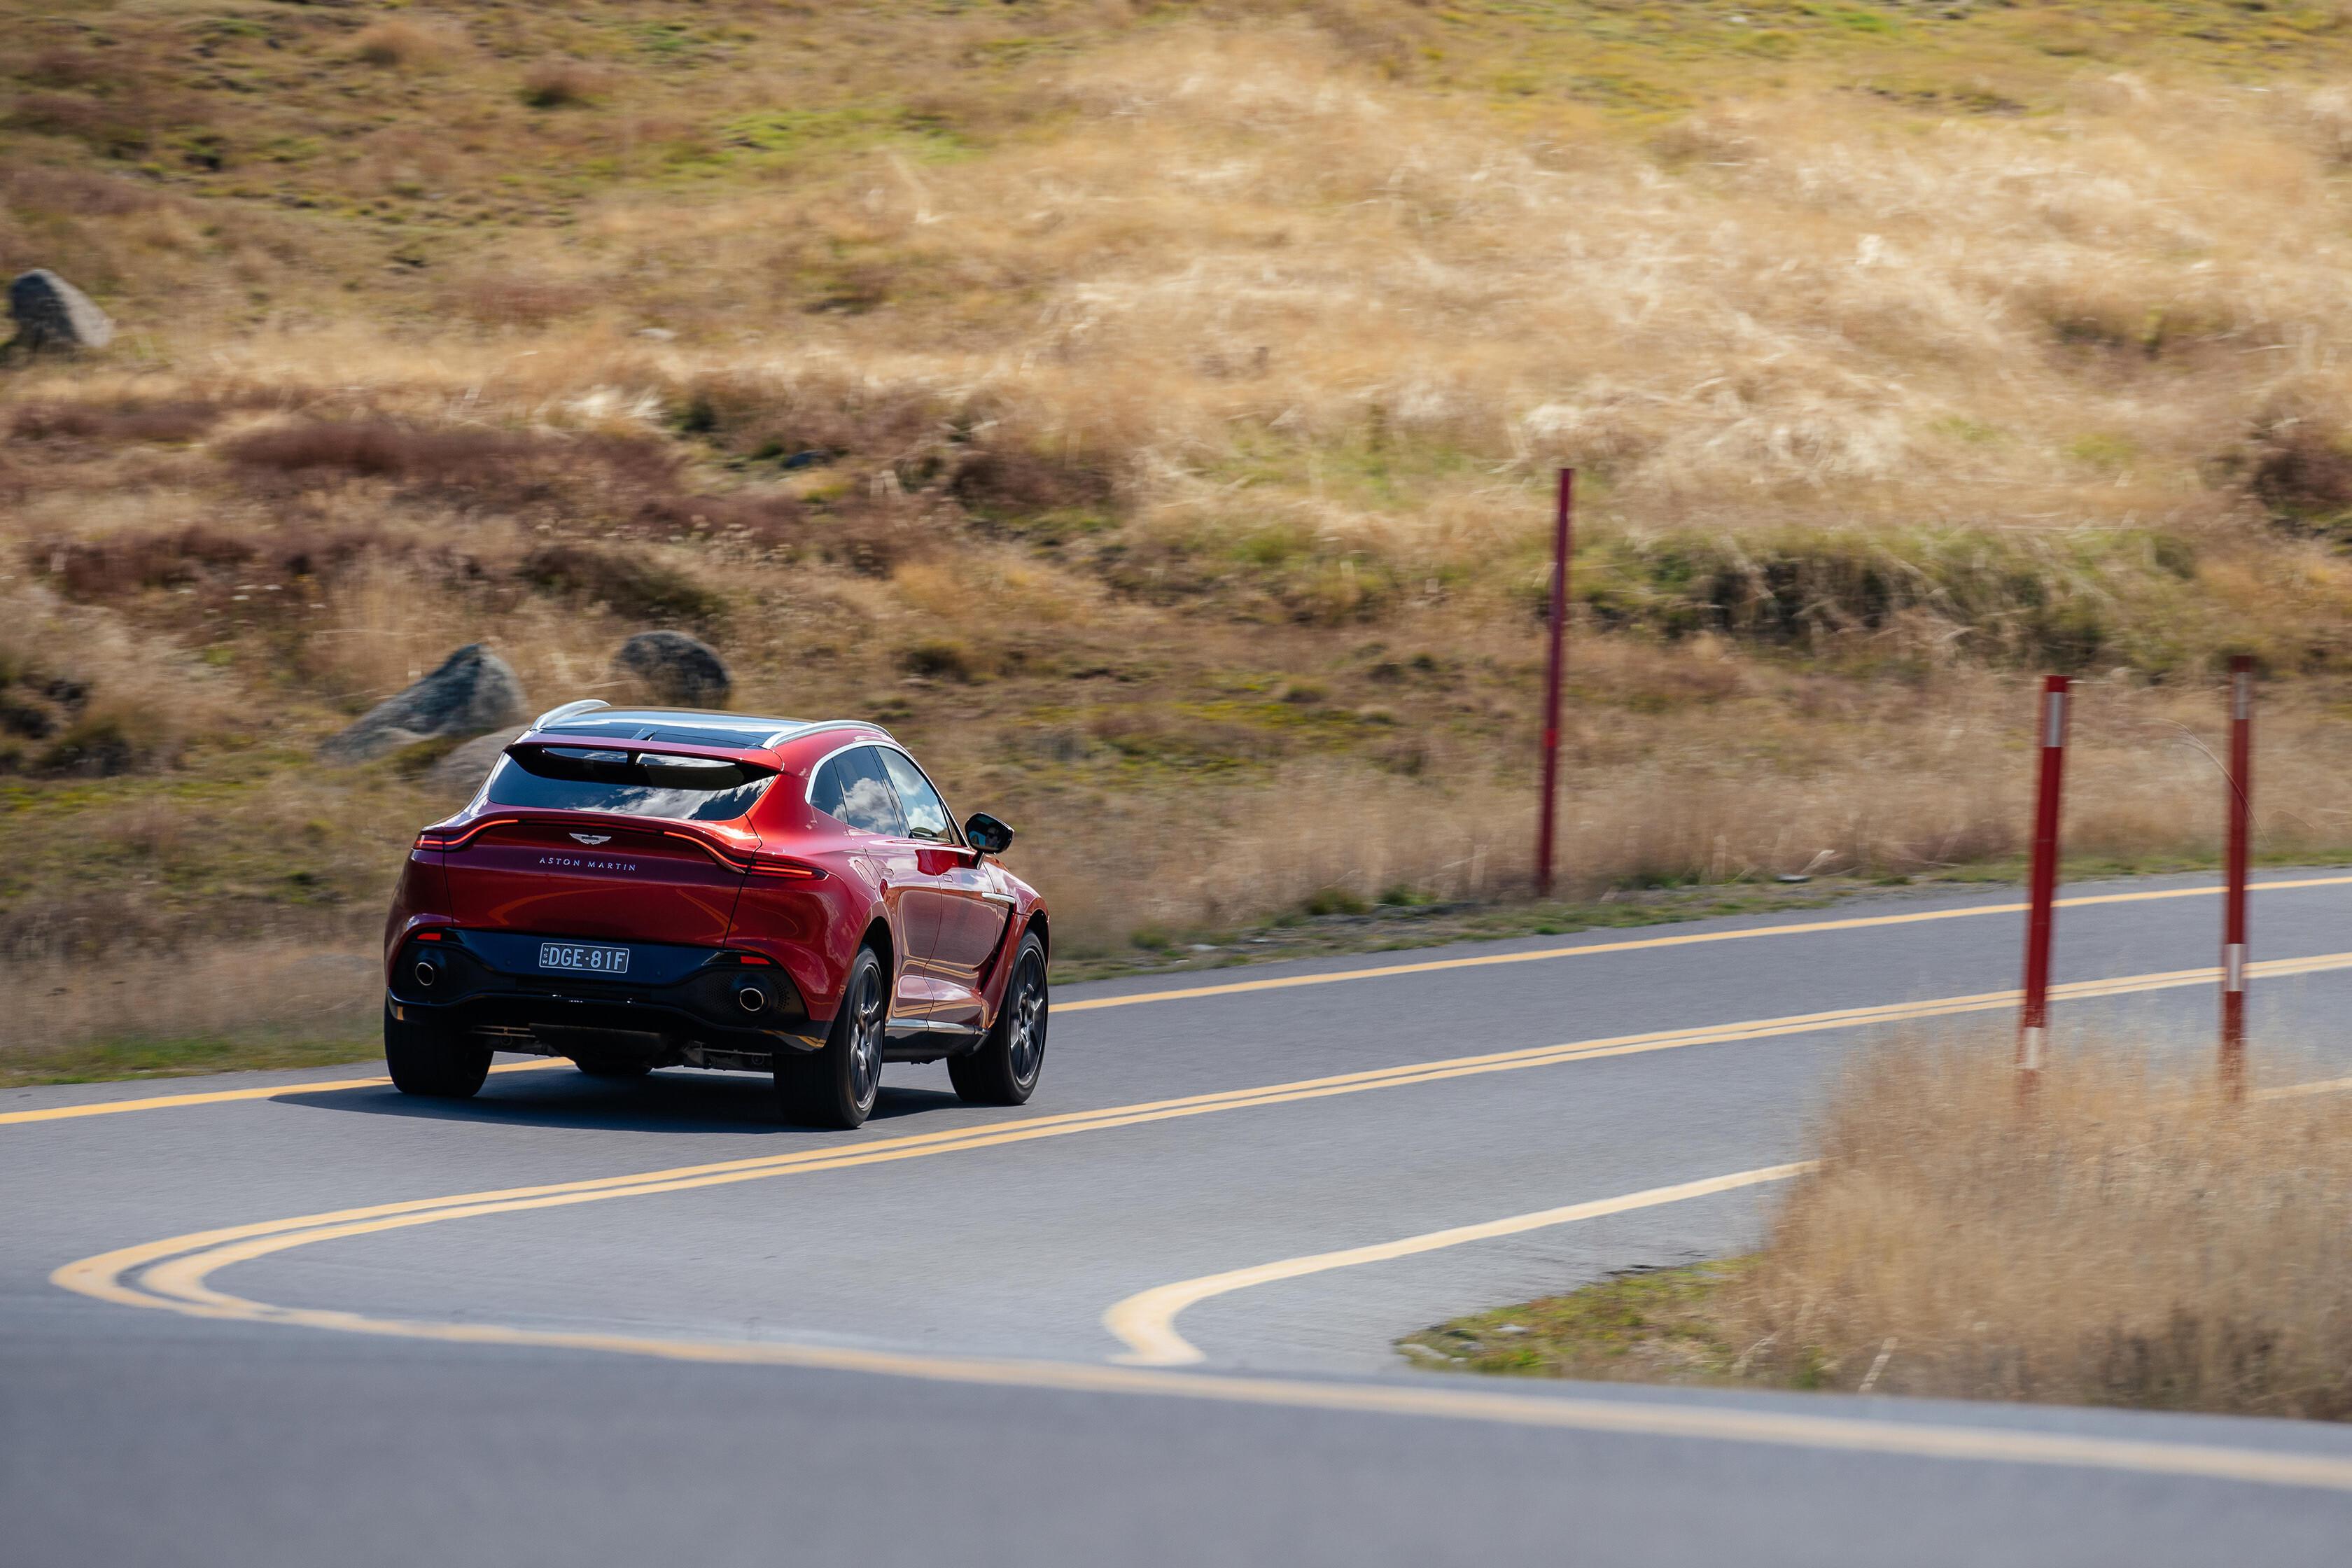 Wheels Reviews 2021 Aston Martin DBX Road Handling Review